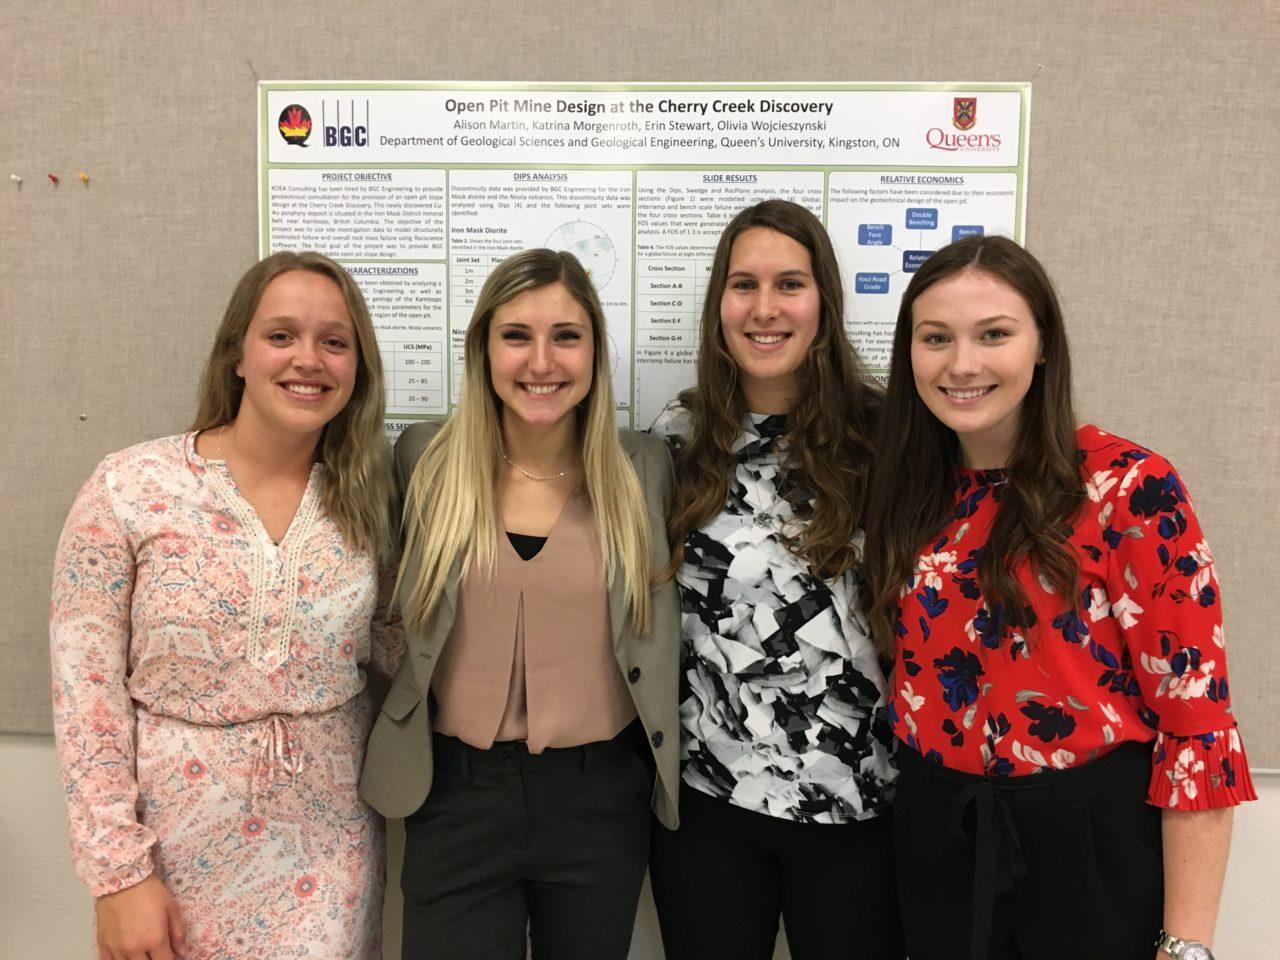 University team photo